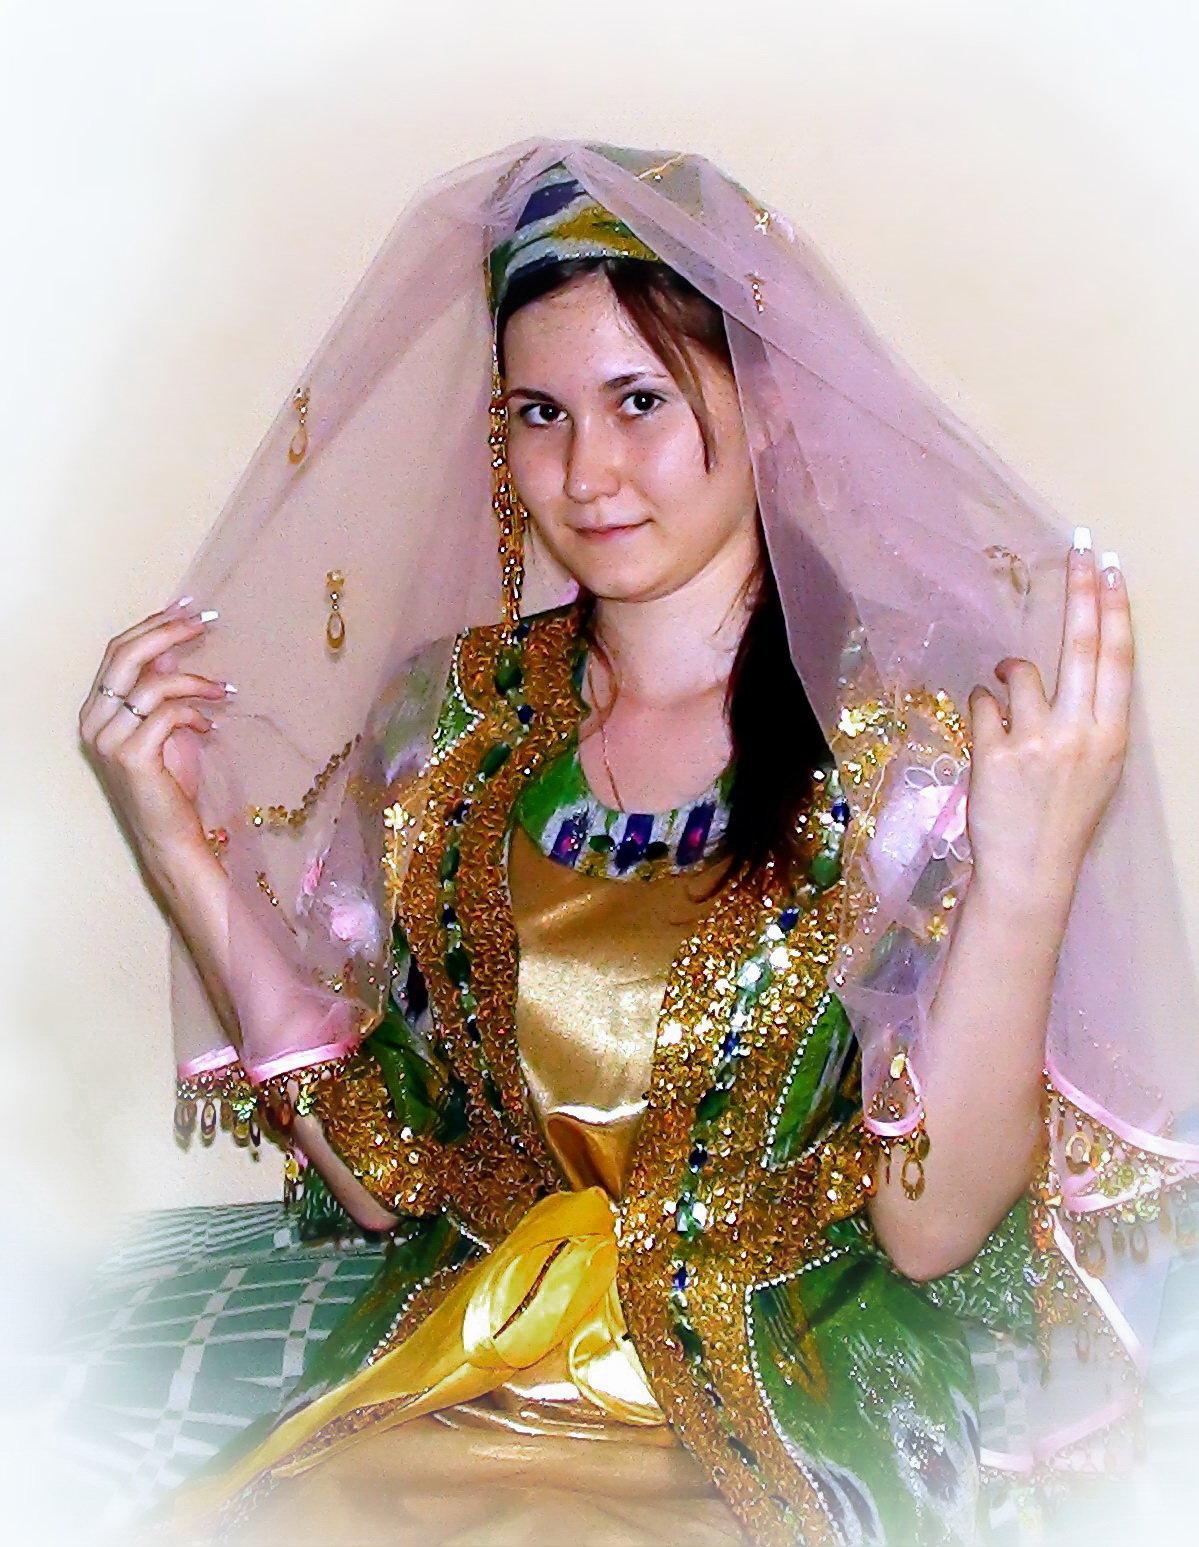 Картинка узбечки невесты